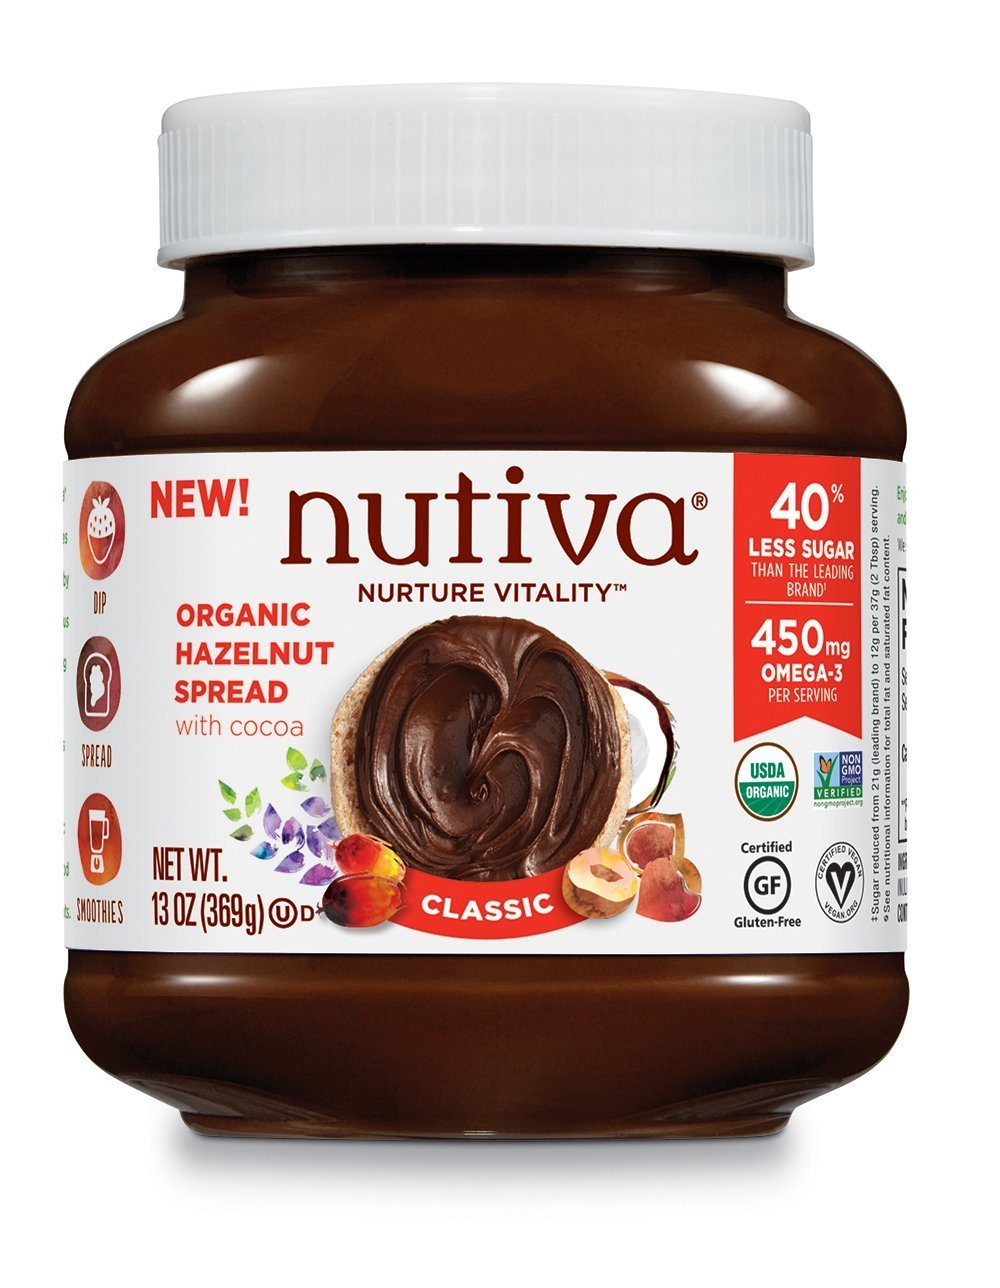 Nutiva Certified Organic, non-GMO, Vegan Hazelnut